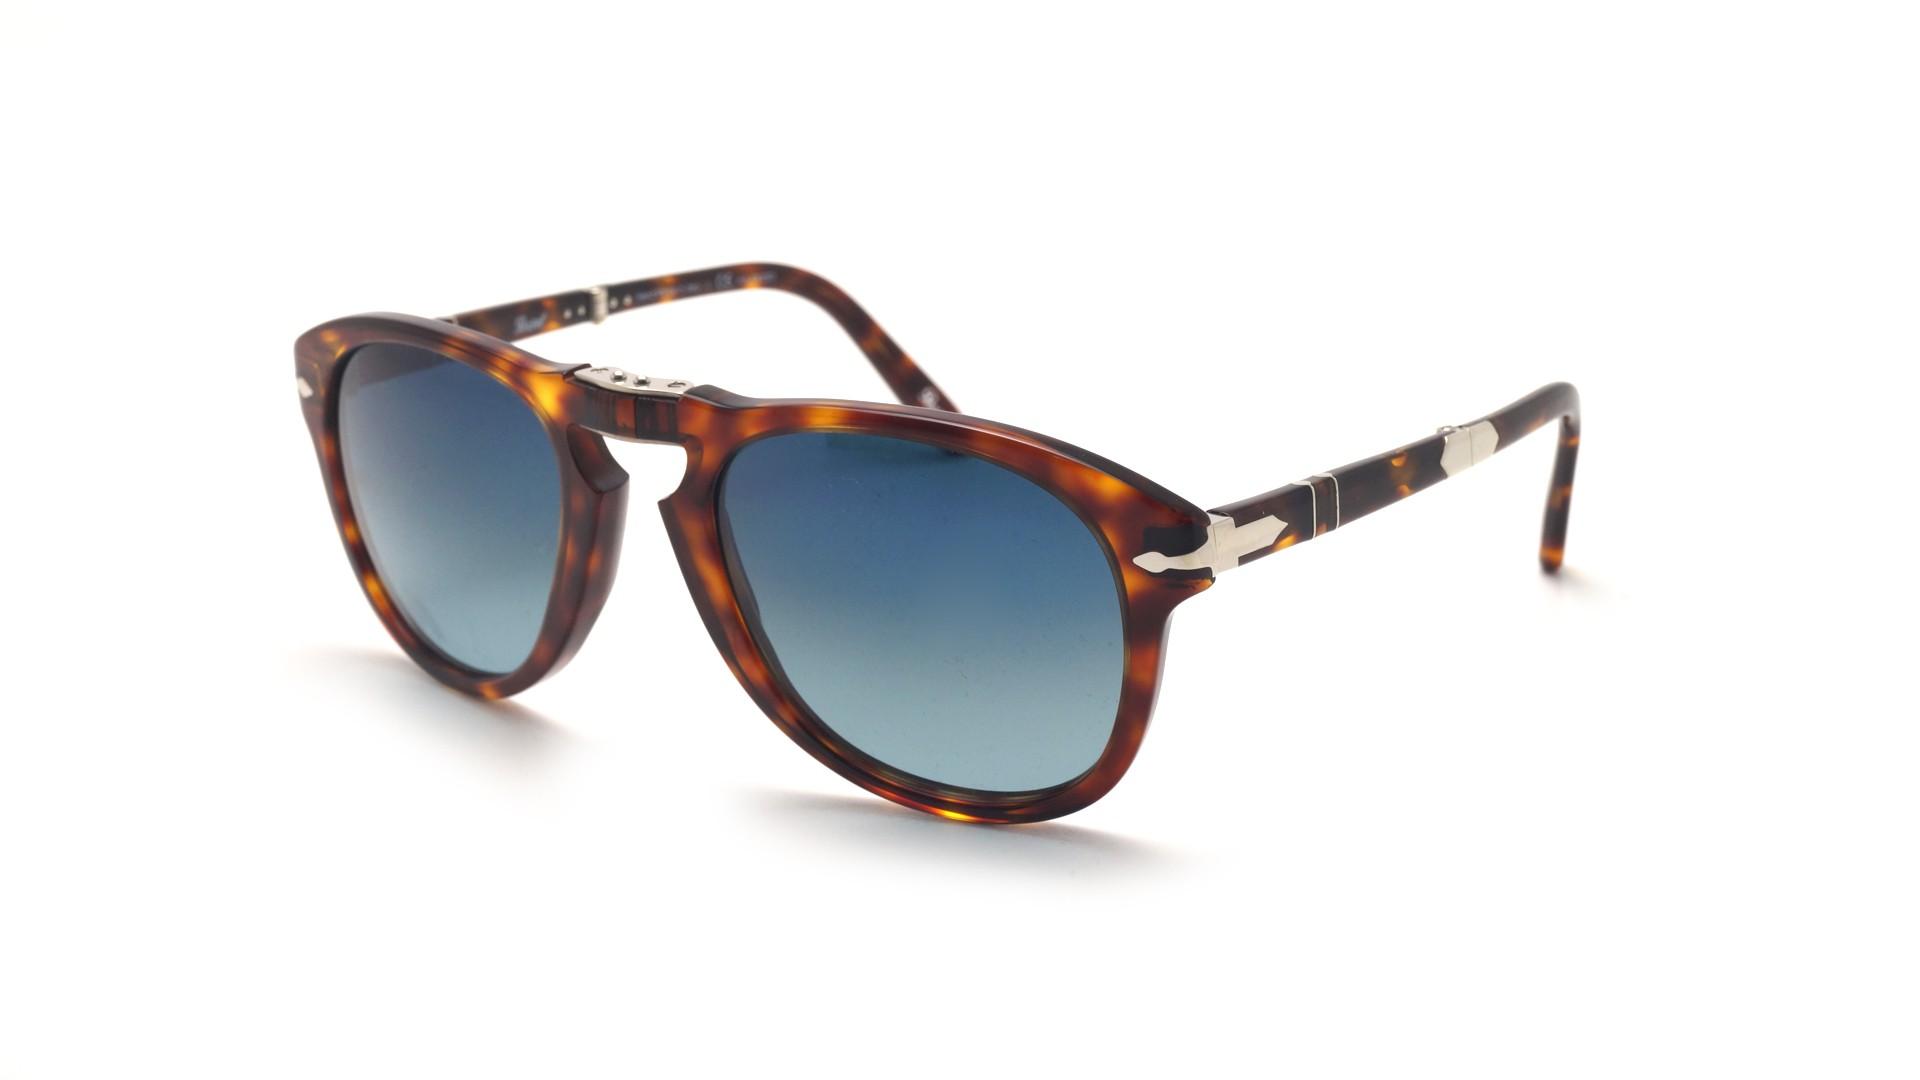 56eb8bc74f57 Sunglasses Persol Steve Mcqueen Tortoise PO0714SM 24/S3 52-21 Medium  Folding Polarized Gradient